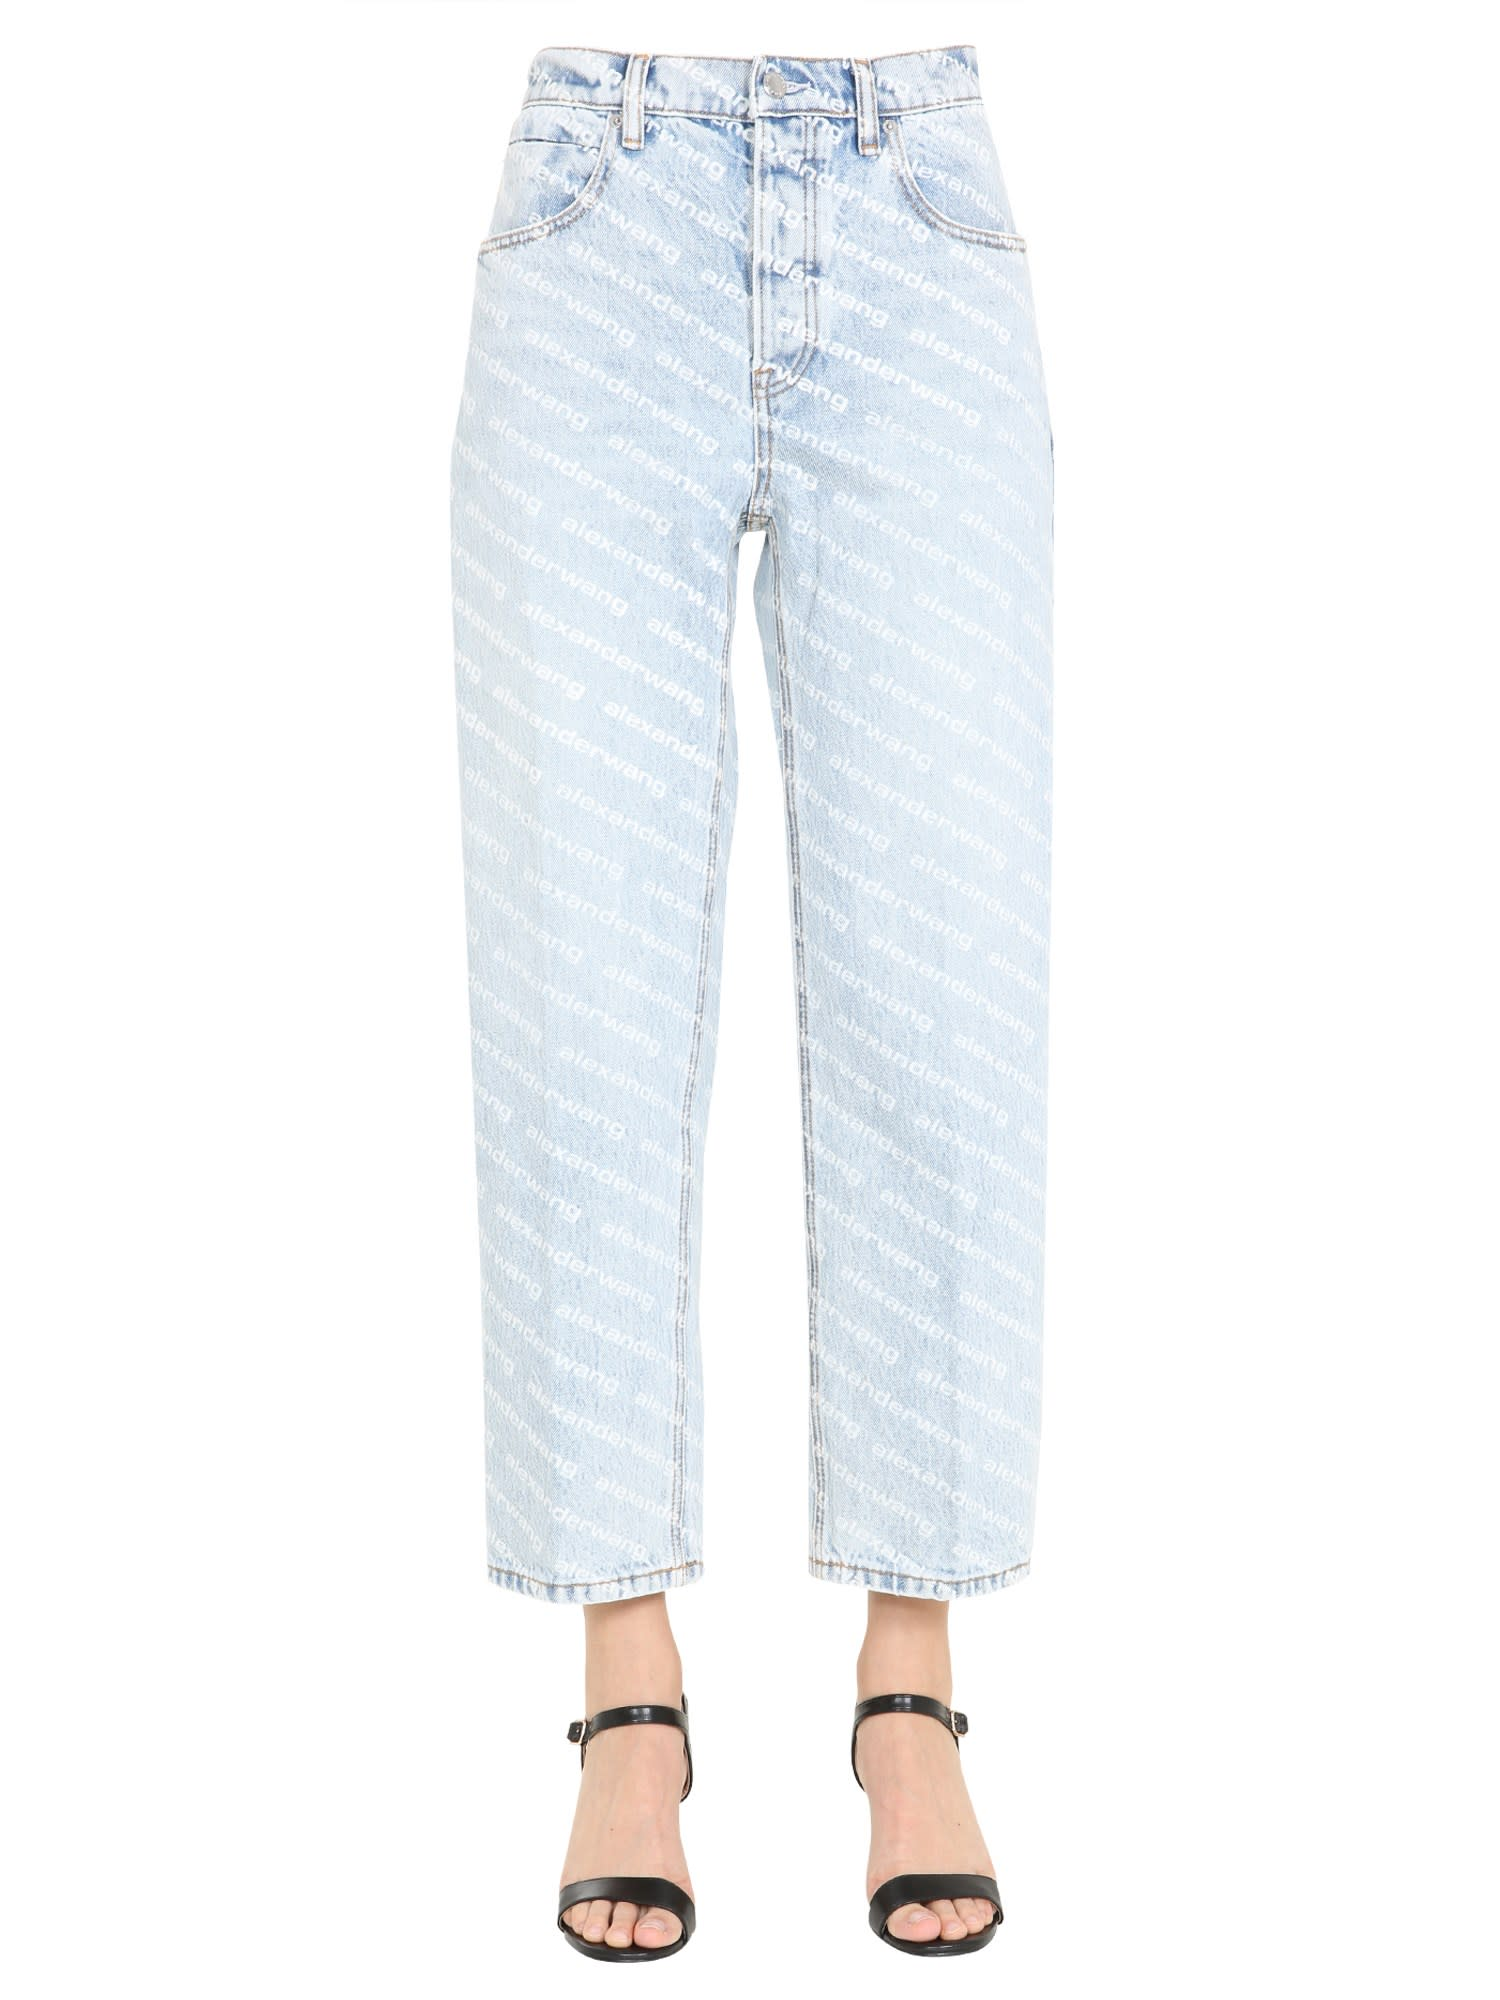 T by Alexander Wang Denim Jeans